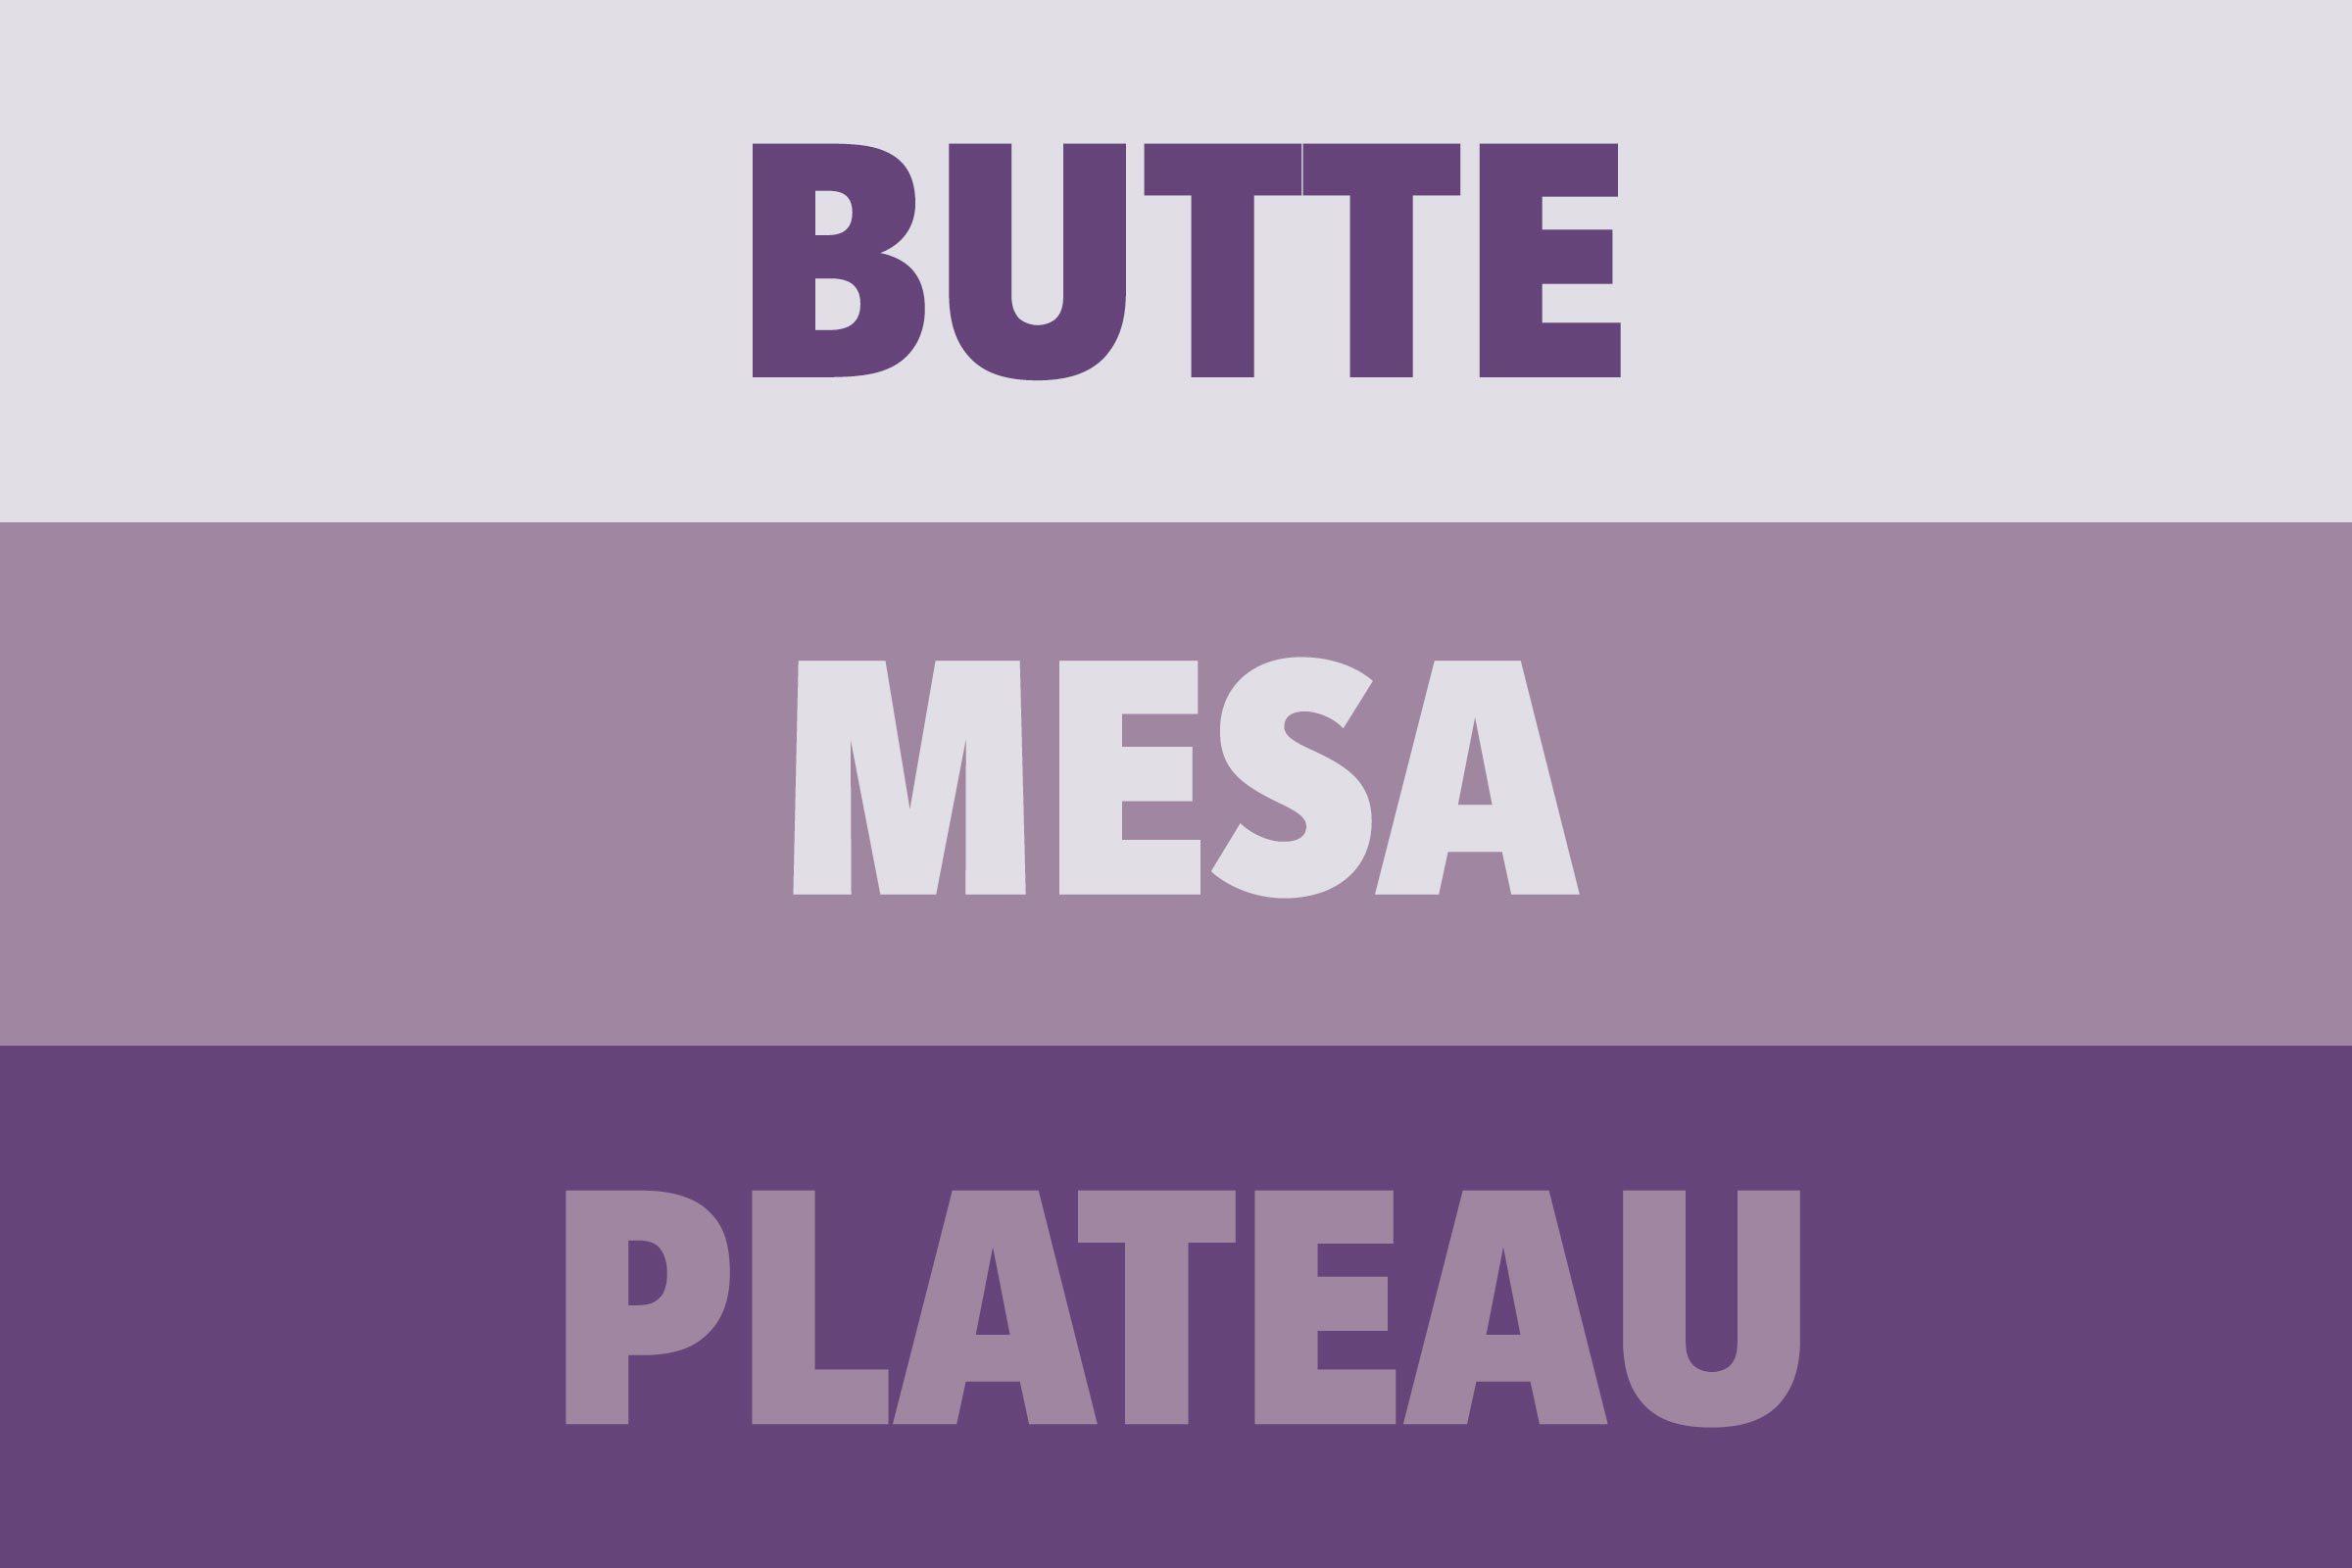 Butte vs Mesa vs Plateau